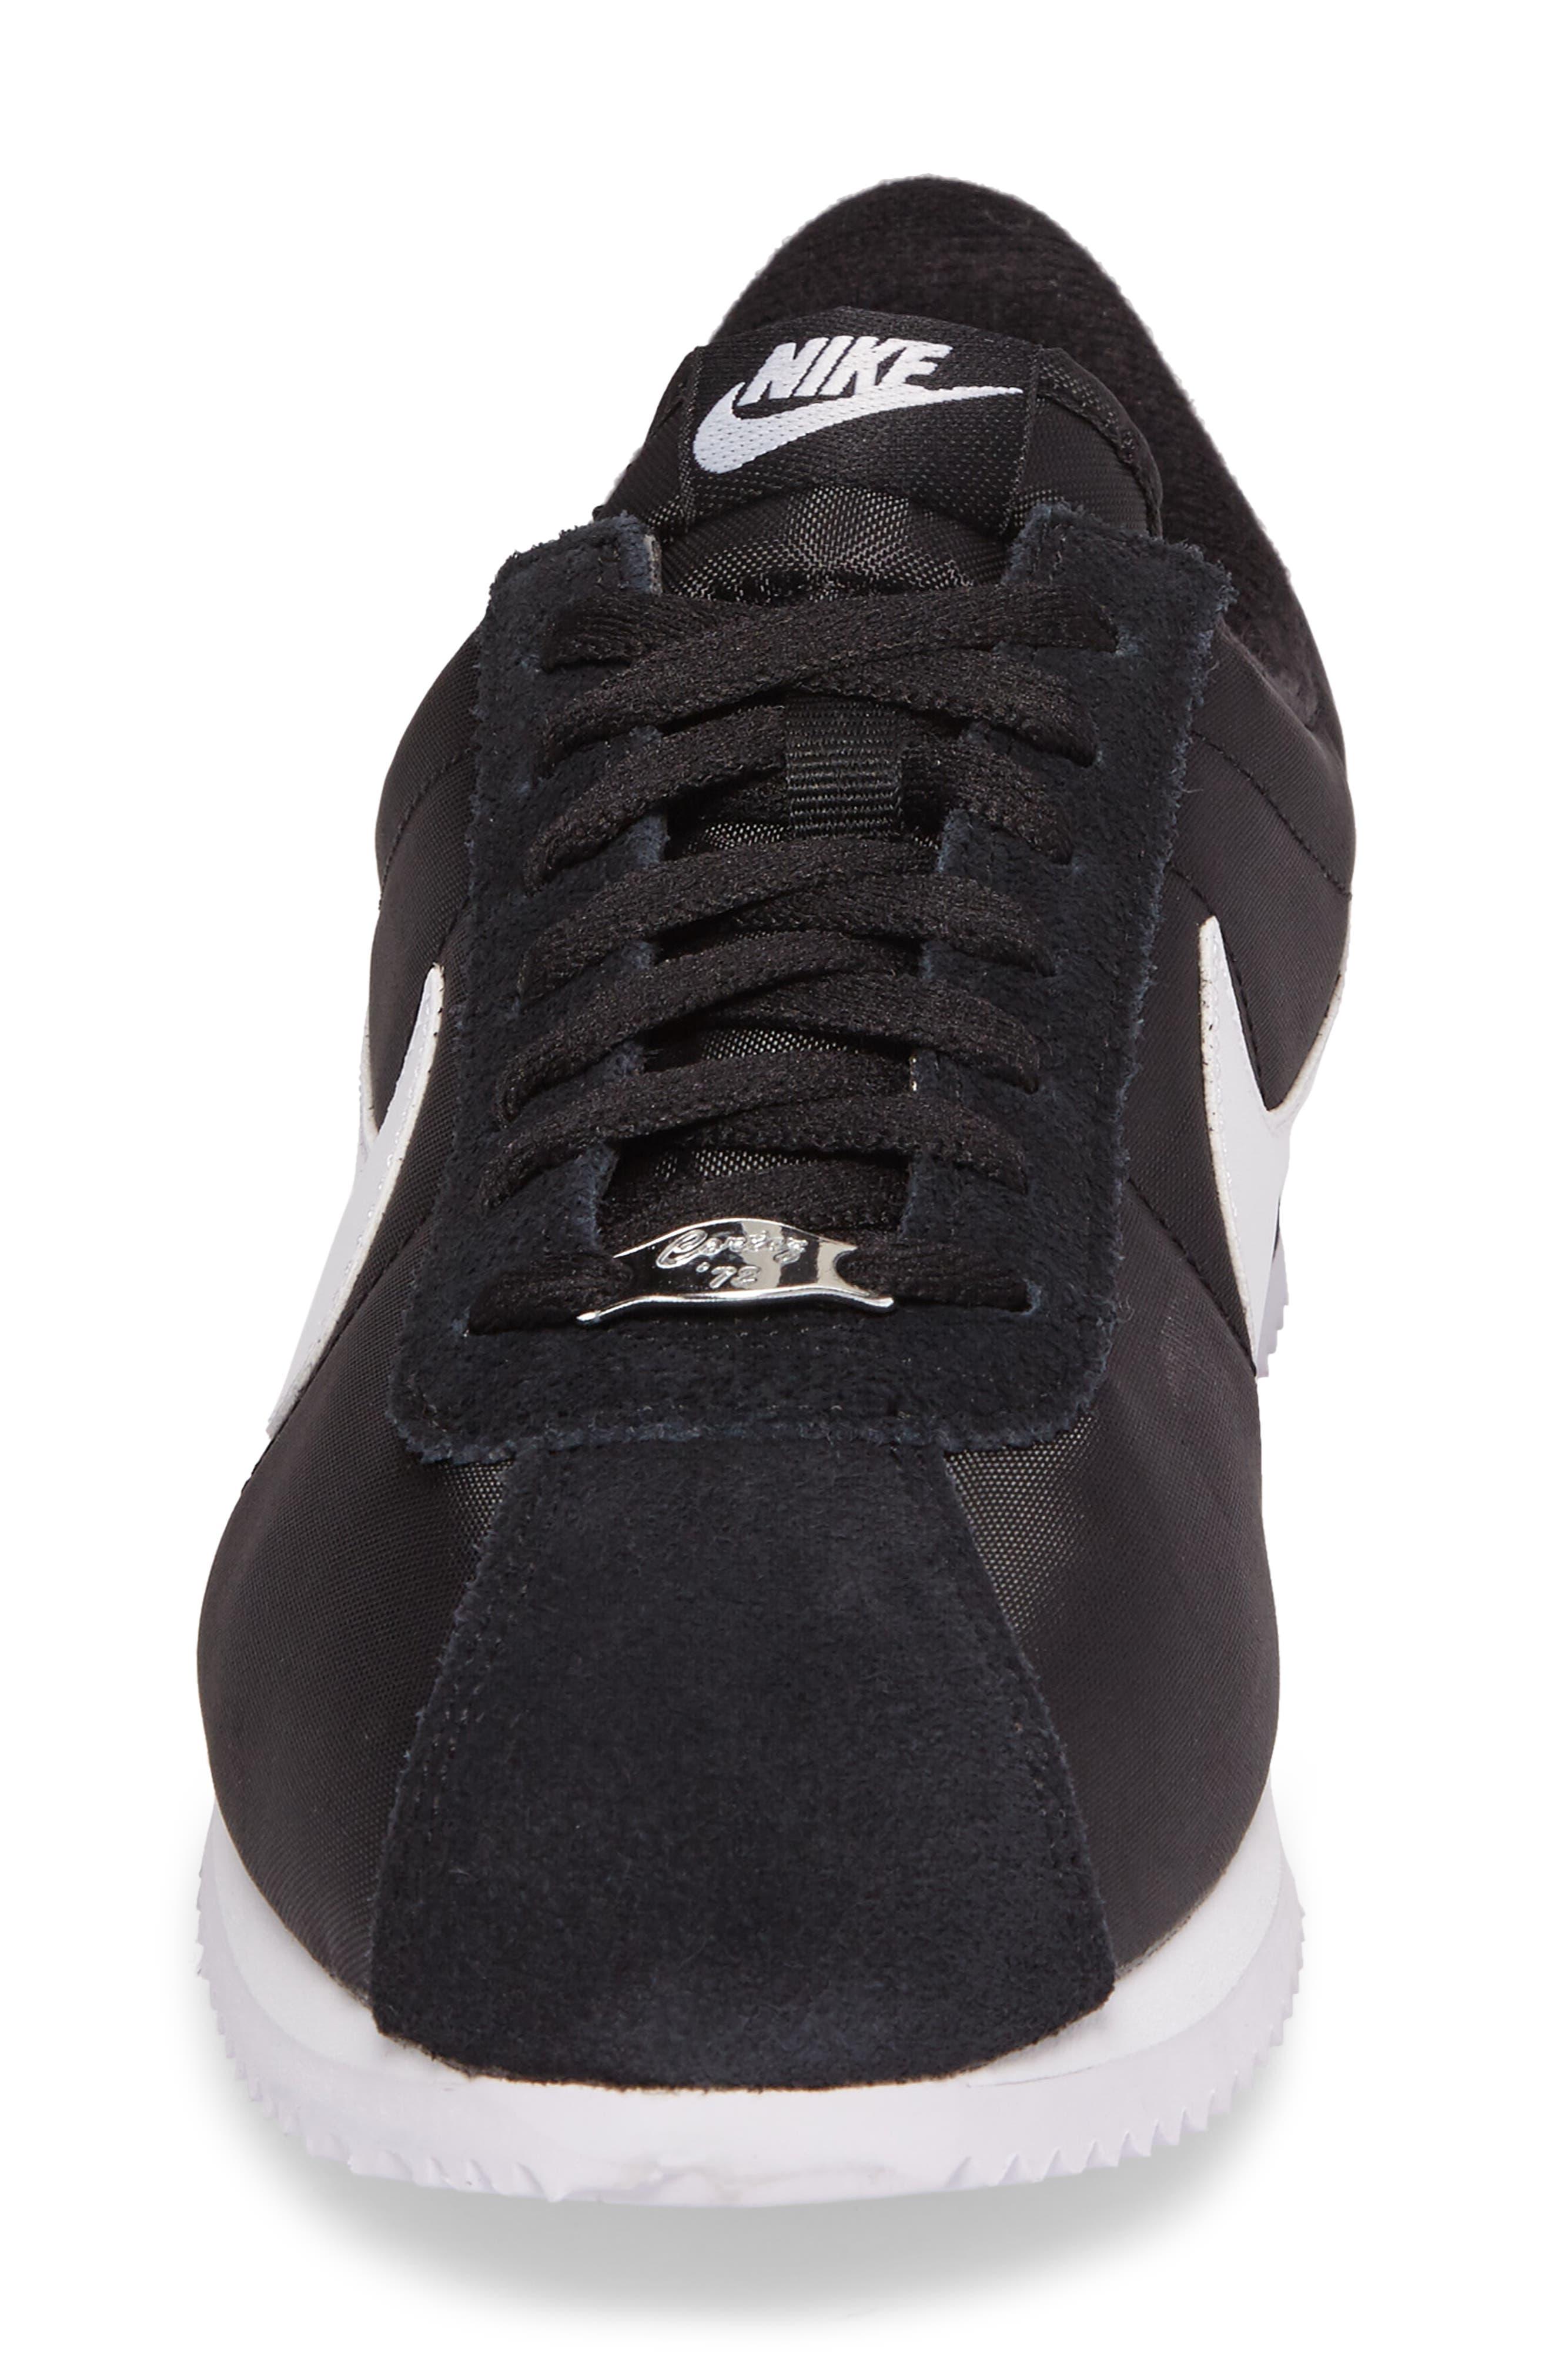 Cortez Basic Nylon Sneaker,                             Alternate thumbnail 4, color,                             BLACK/WHITE/METALLIC SILVER